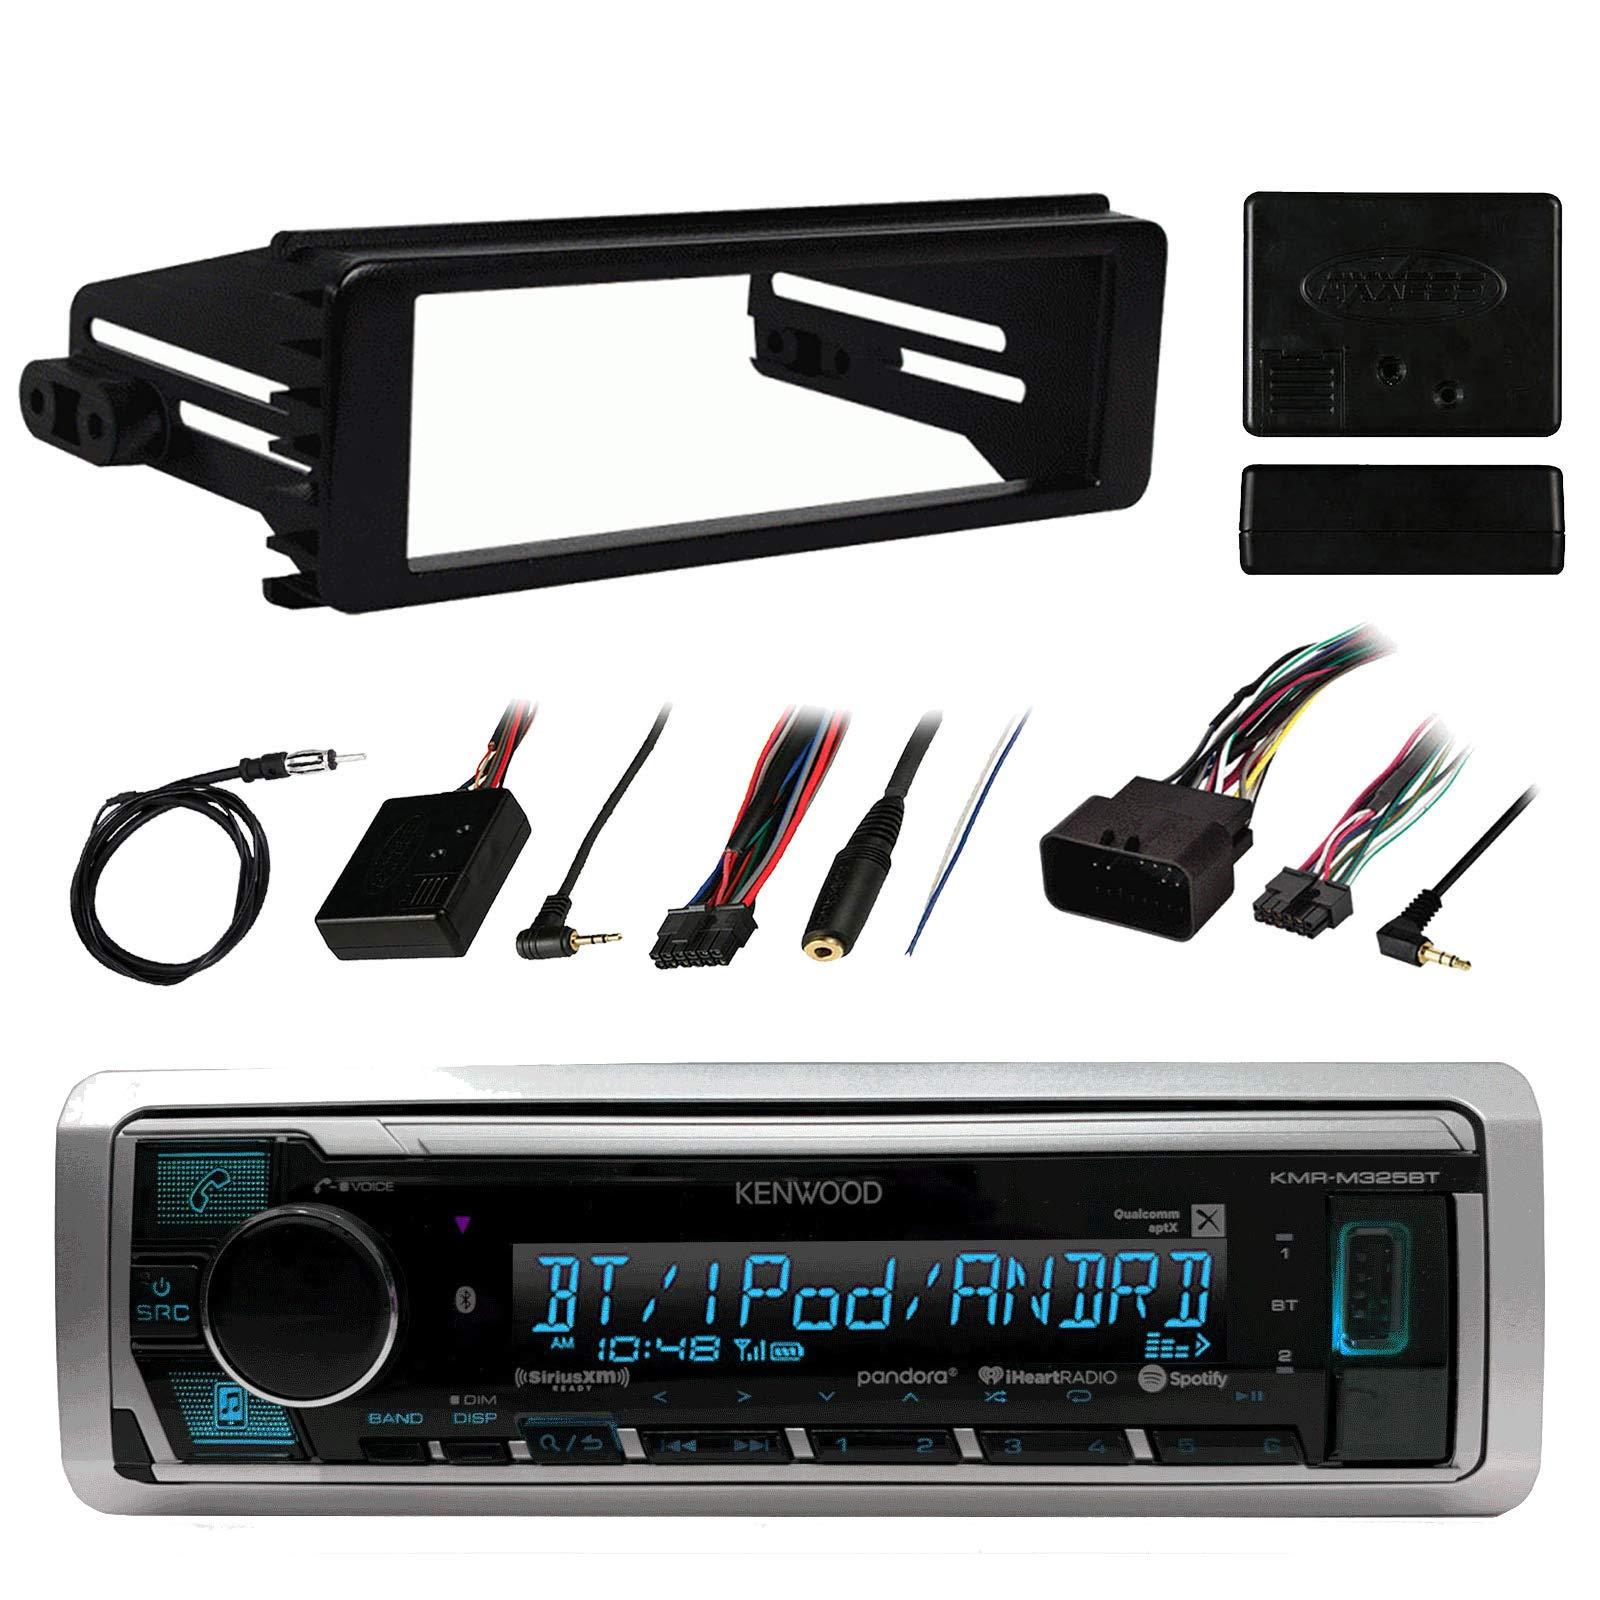 Kenwood Marine Digital Media Bluetooth Receiver, Metra Steering Wheel Interface, Antenna - 40'', 1998-2013 Harley Davidson Single-DIN Stereo Installation Kit